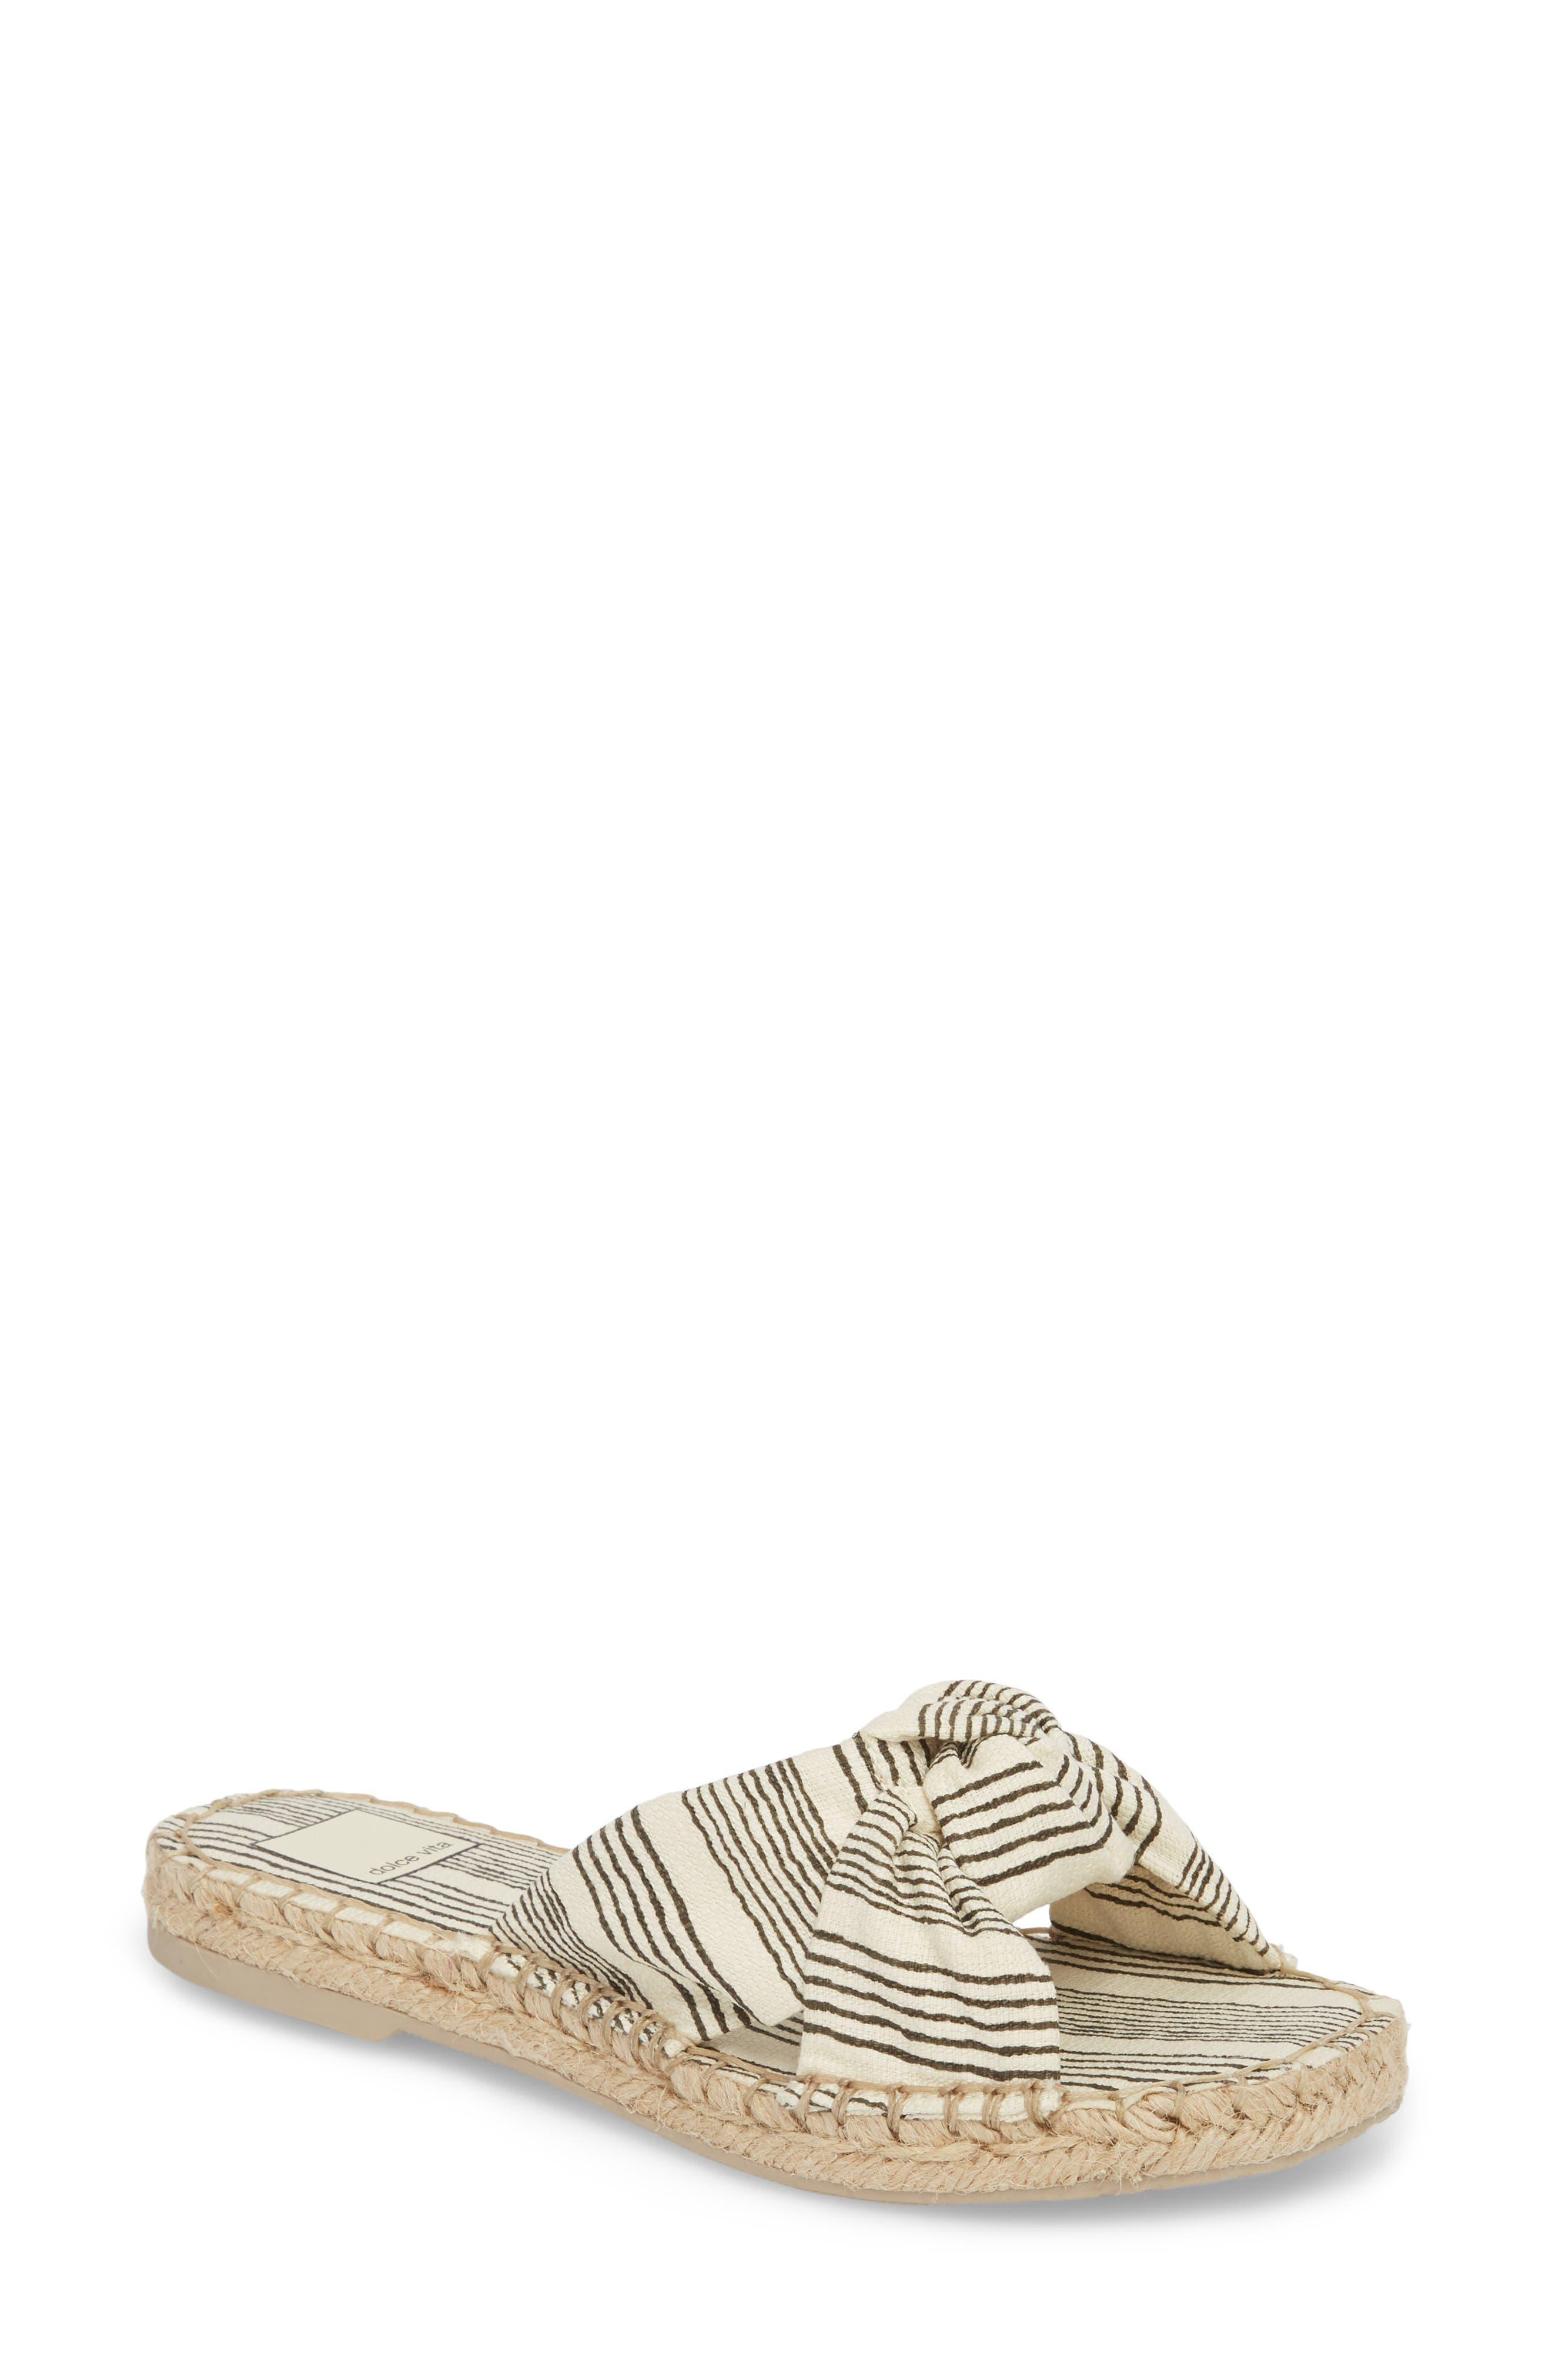 Dolce Vita Women's Benicia Knotted Slide Sandal VZT7QOLLU